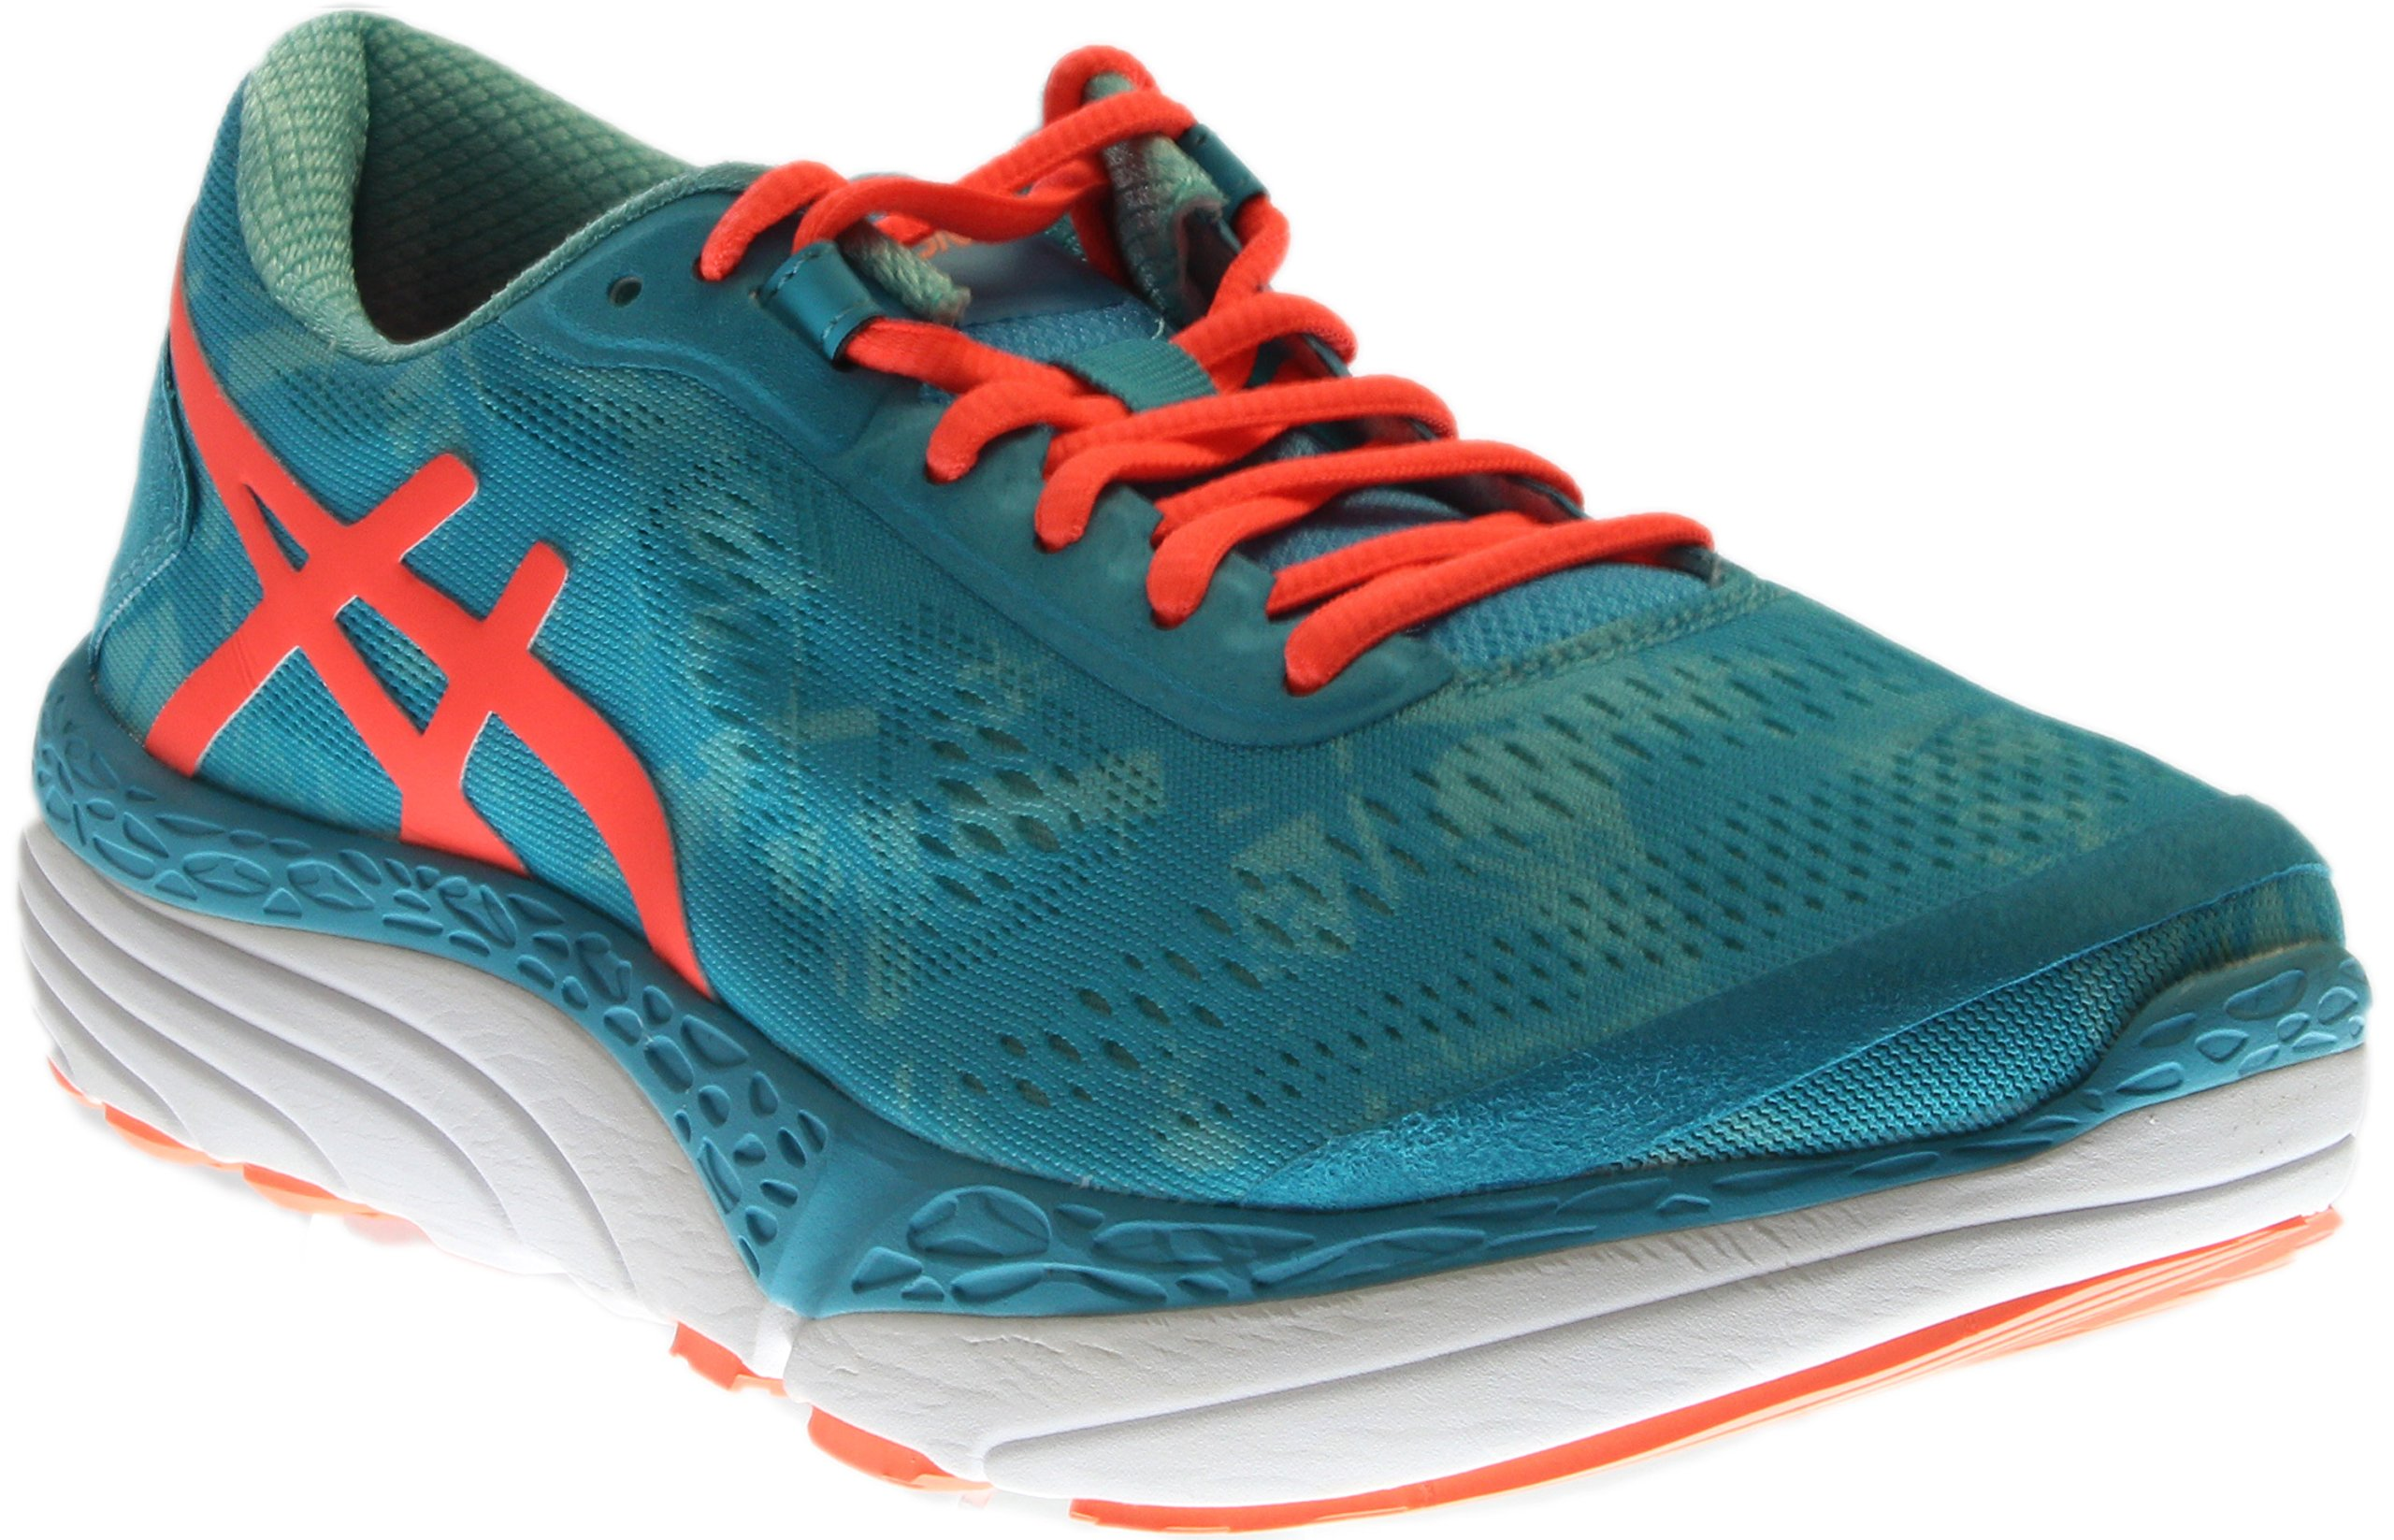 ASICS Women's 33-M 2 Running Shoe, Aquarium/Flash Coral/Aruba Blue, 9.5 M US by ASICS (Image #1)